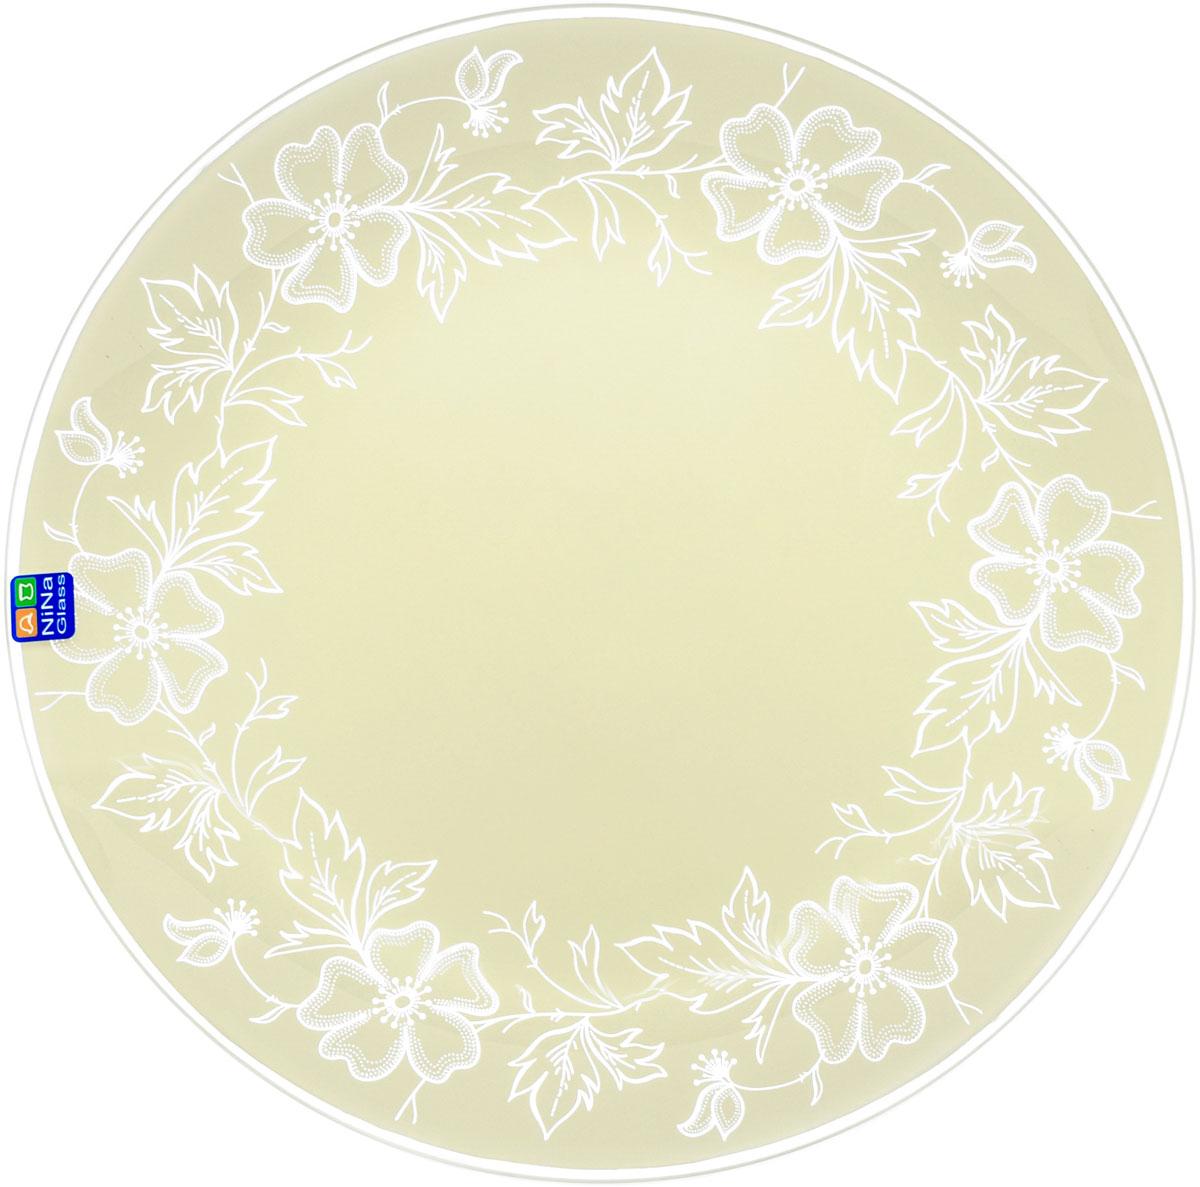 Тарелка круглая Nina Glass Лара, цвет: белый, диаметр 26 см салатник nina glass ажур цвет сиреневый диаметр 16 см